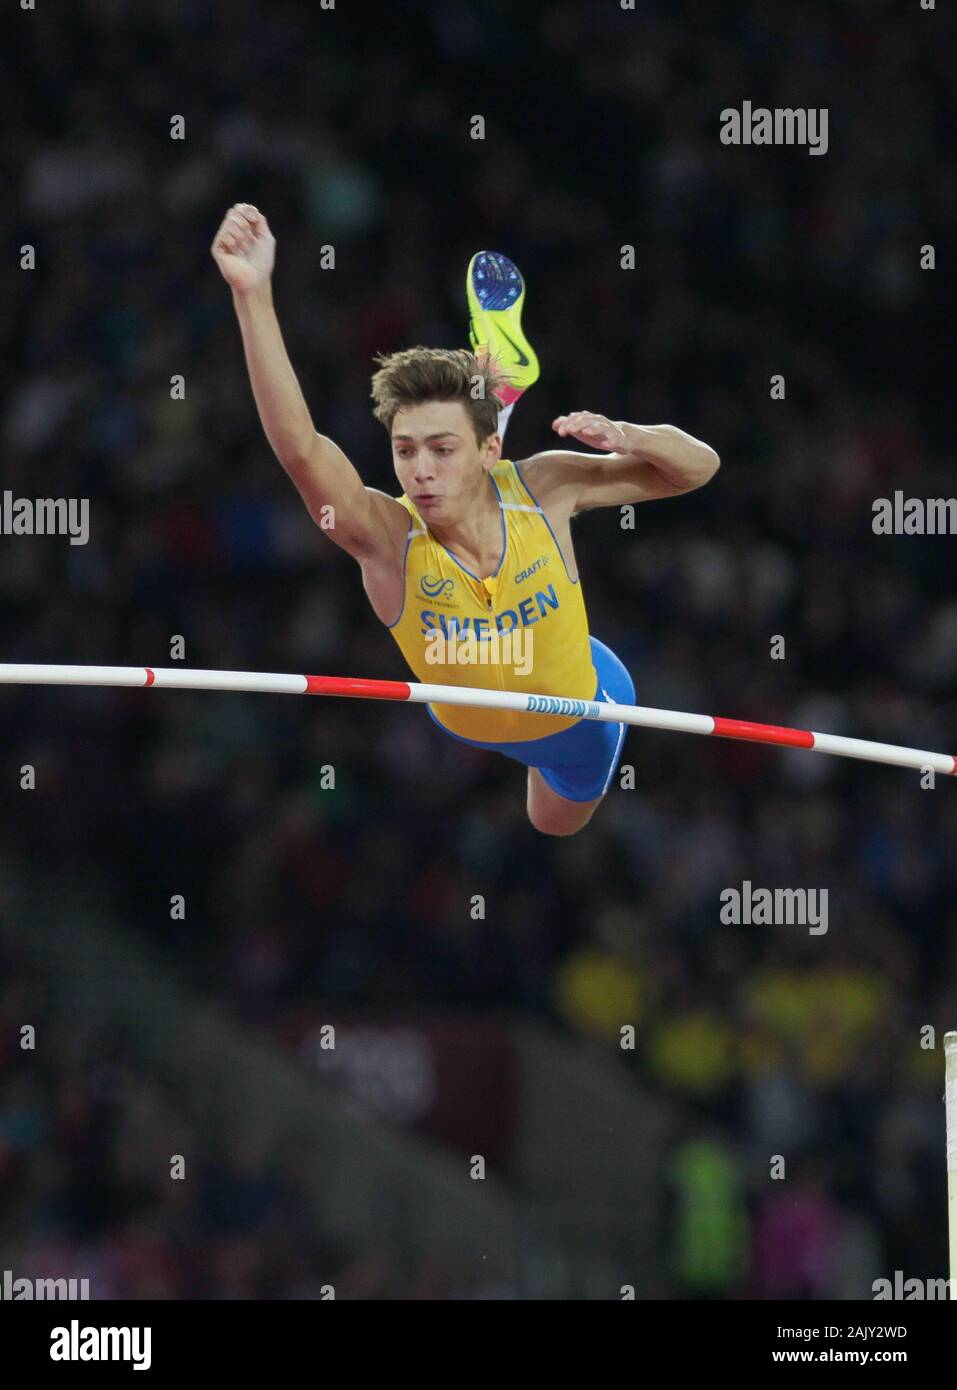 Armand Duplantis Sweden during the Final Pole Vault Men of the ...